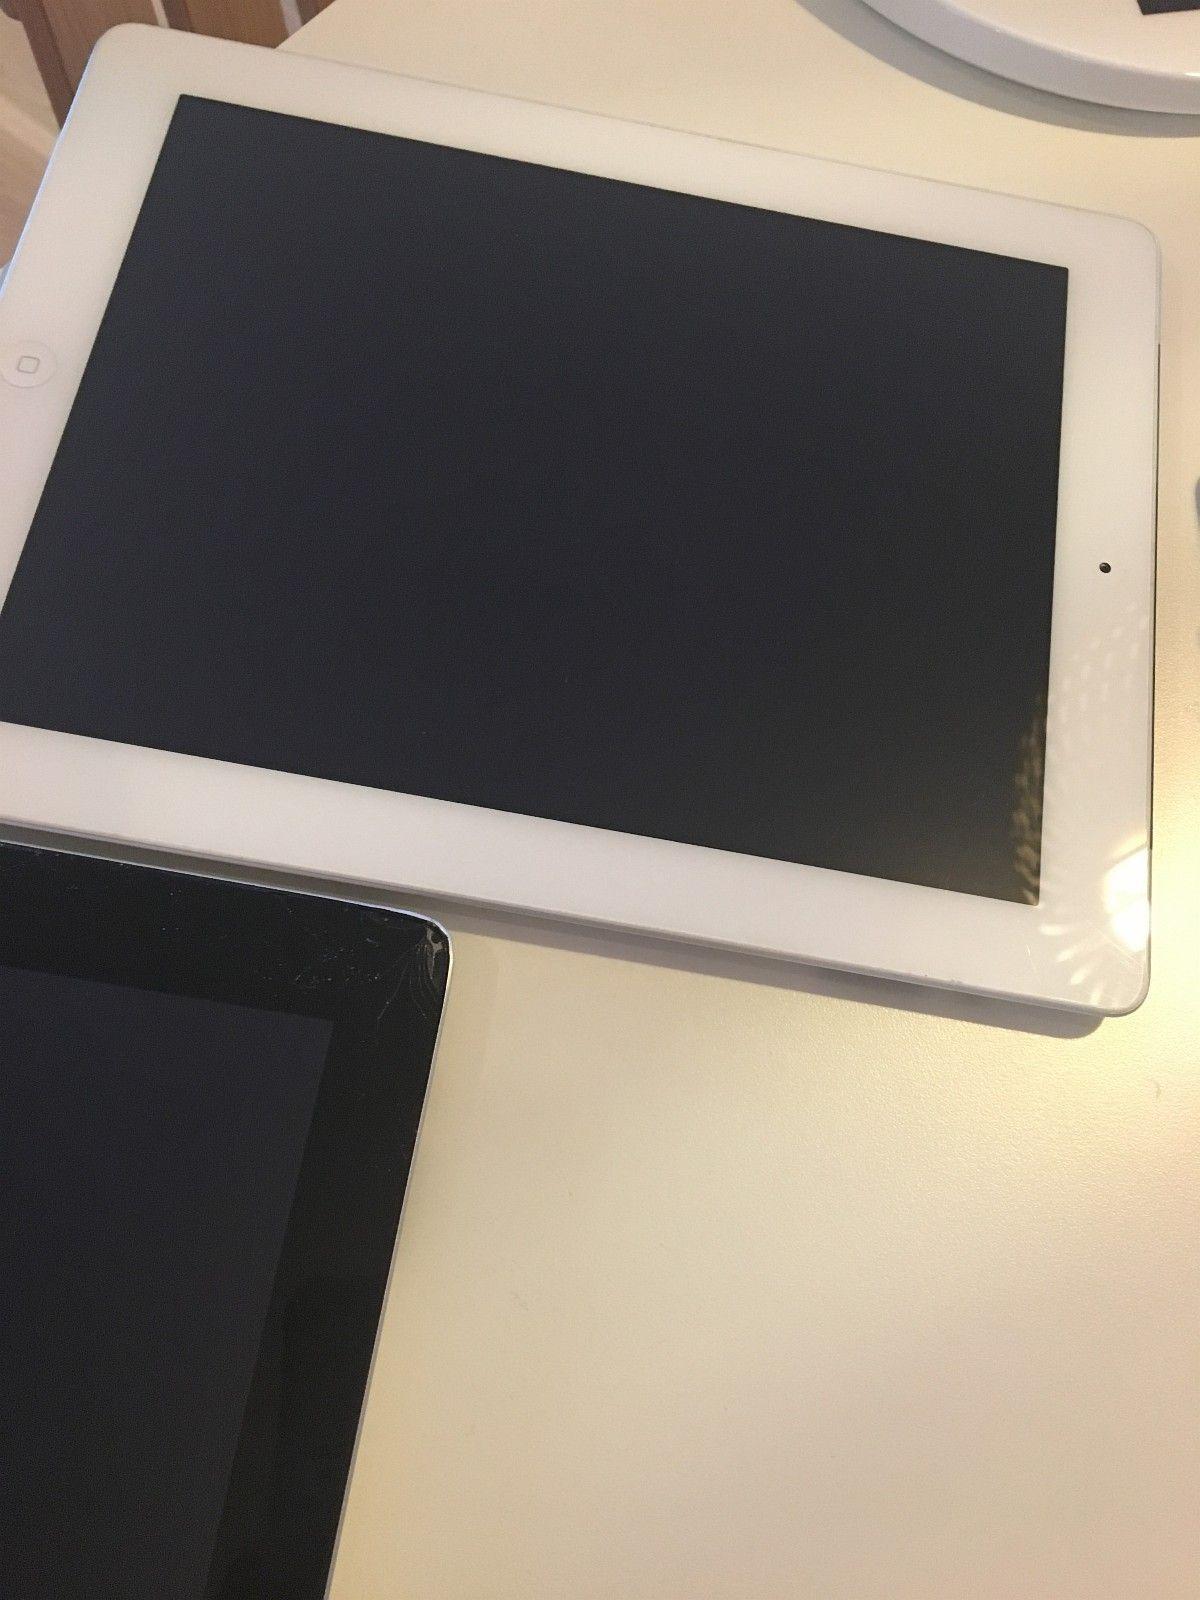 Ipad - ålesund  - iPad 4 32 G hel og uskadd selges hbo. 1500,-og iPad 2 16 G med knust skjerm i ene hjørnet selges hbo. 800,- - ålesund